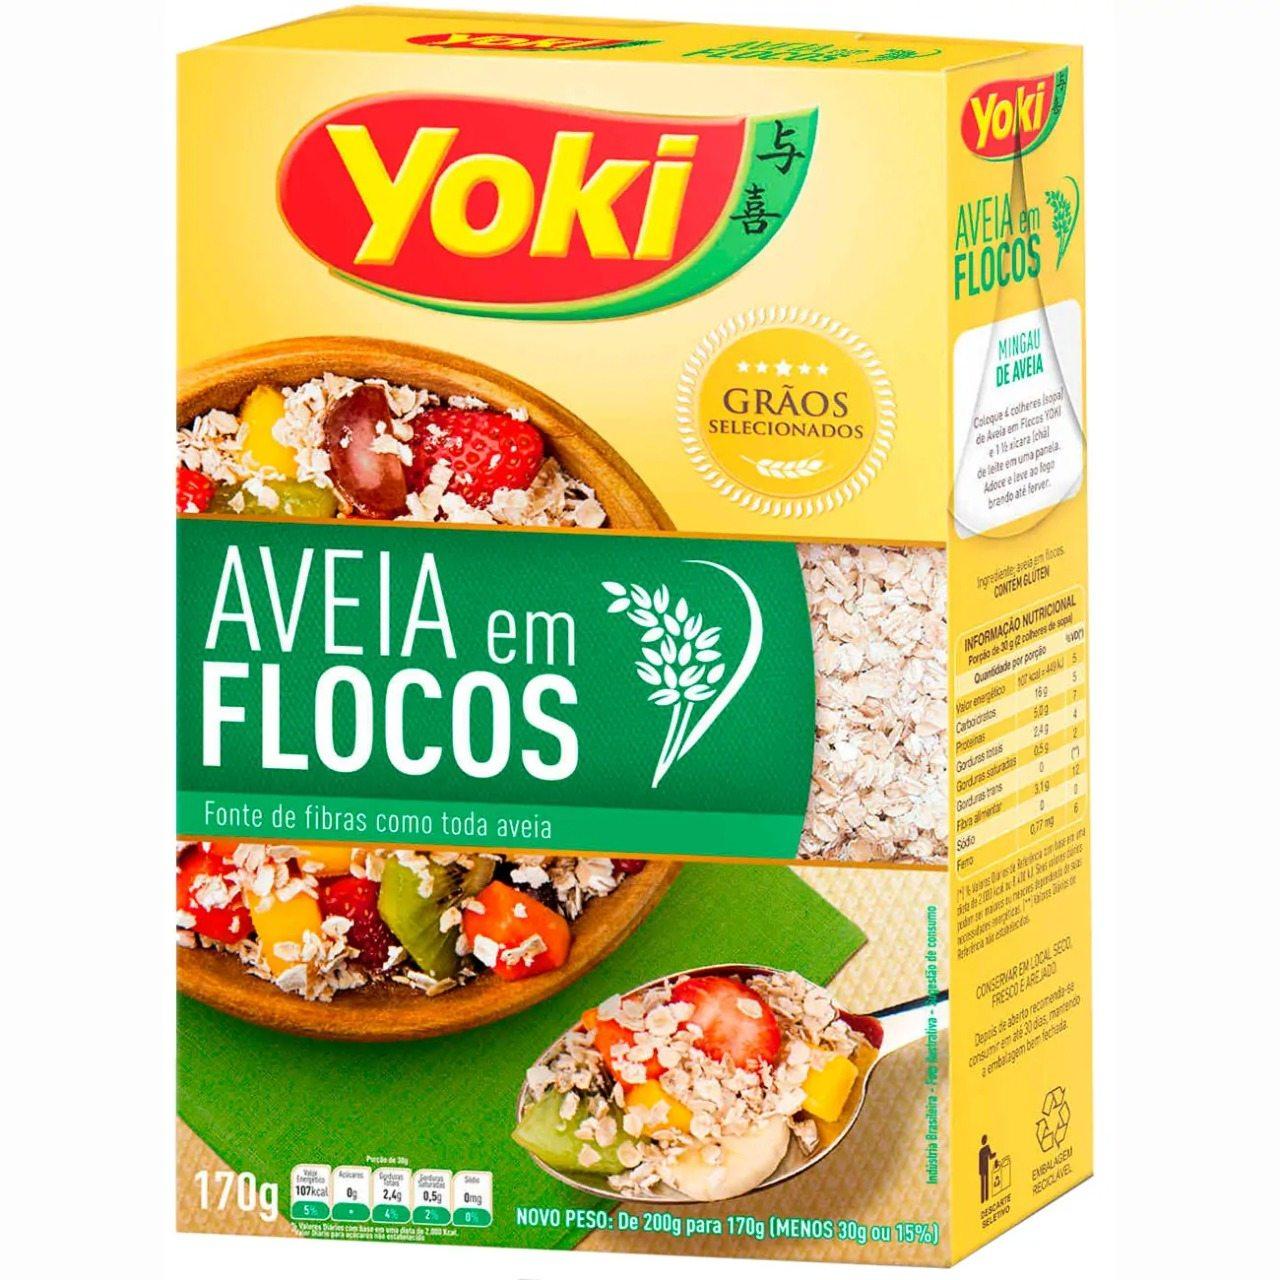 AVEIA EM FLOCOS YOKI 170 G